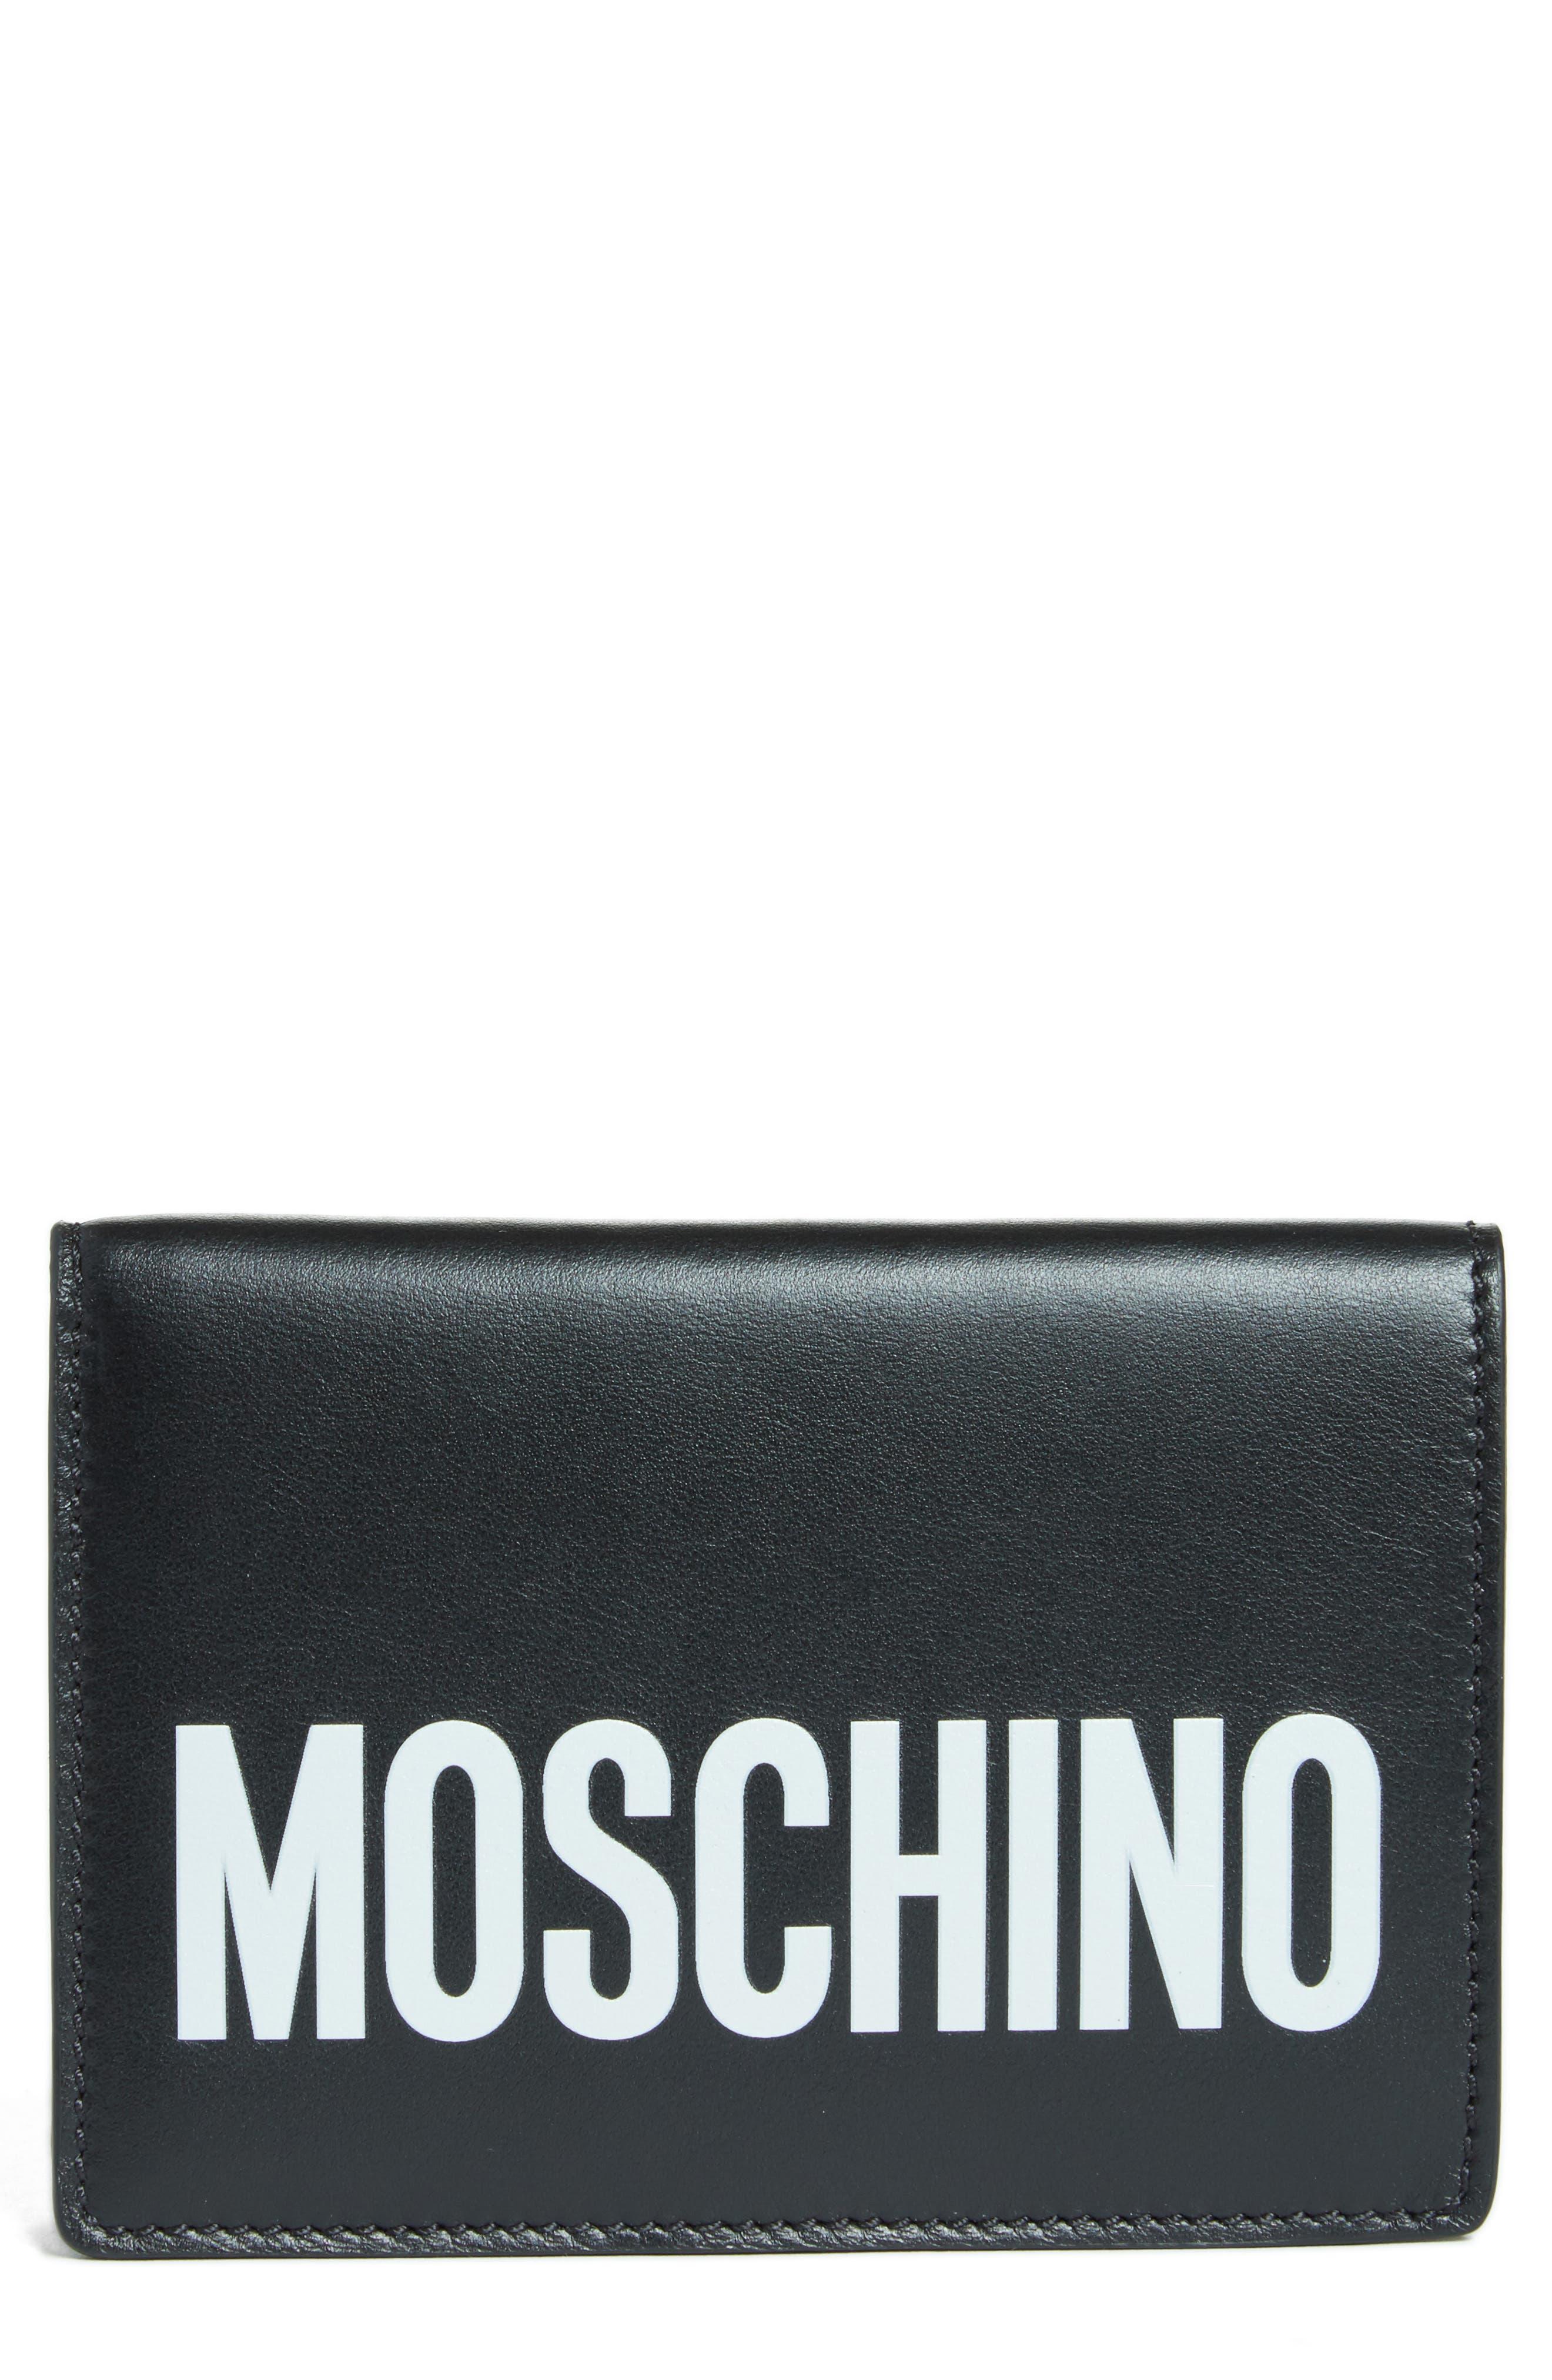 Alternate Image 1 Selected - Moschino Logo Leather Passport Holder